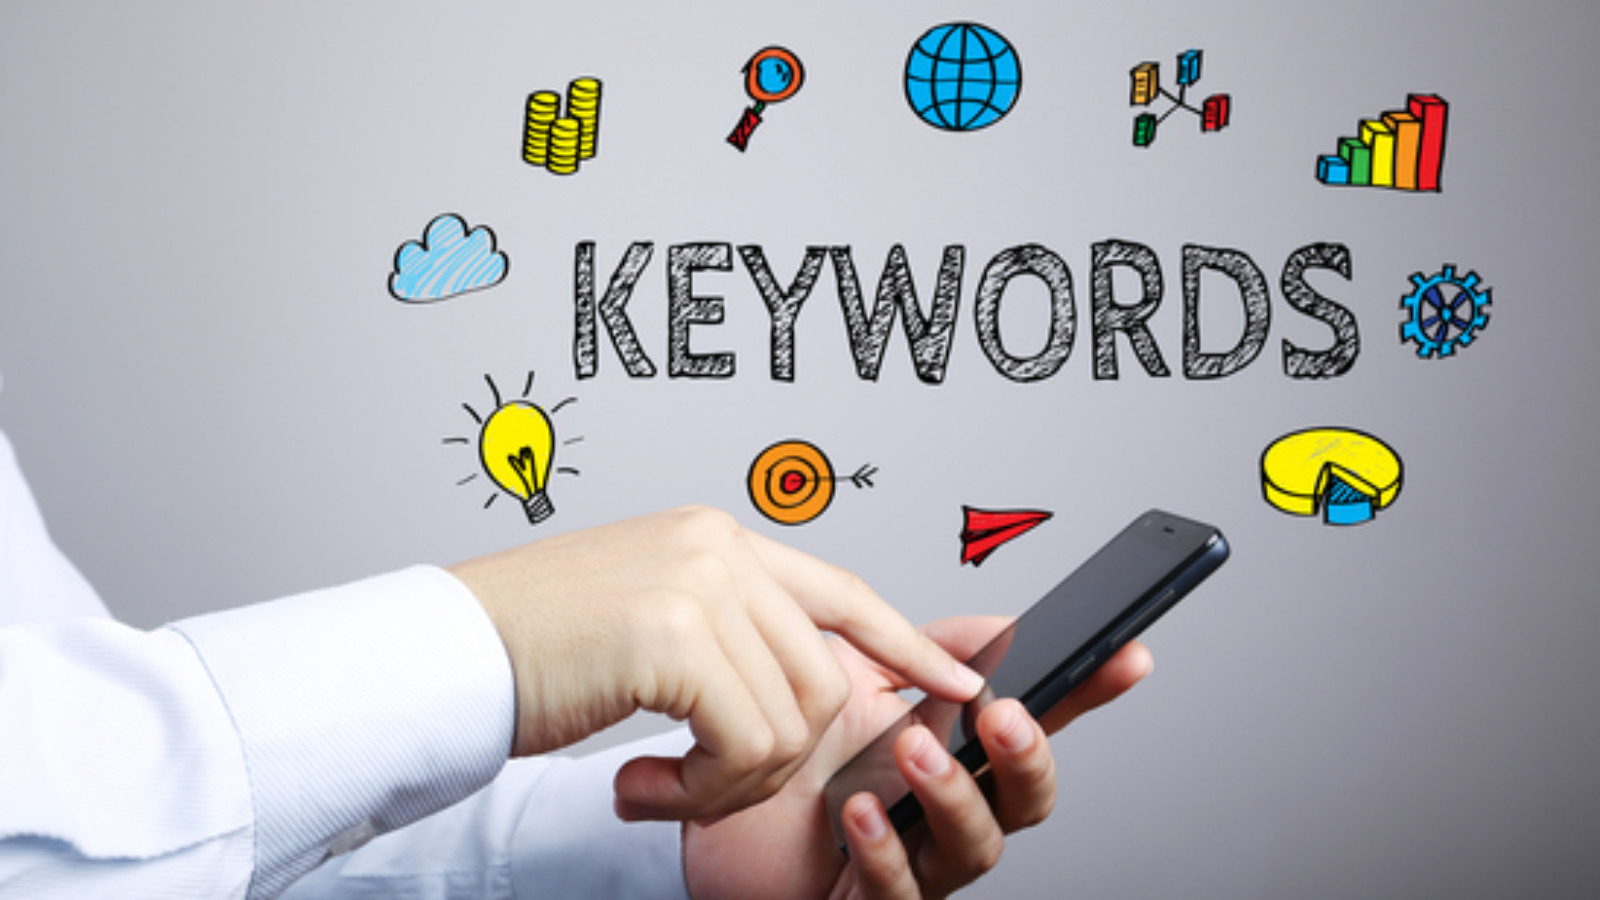 Keyword Research Markham Marketing Company Ontario